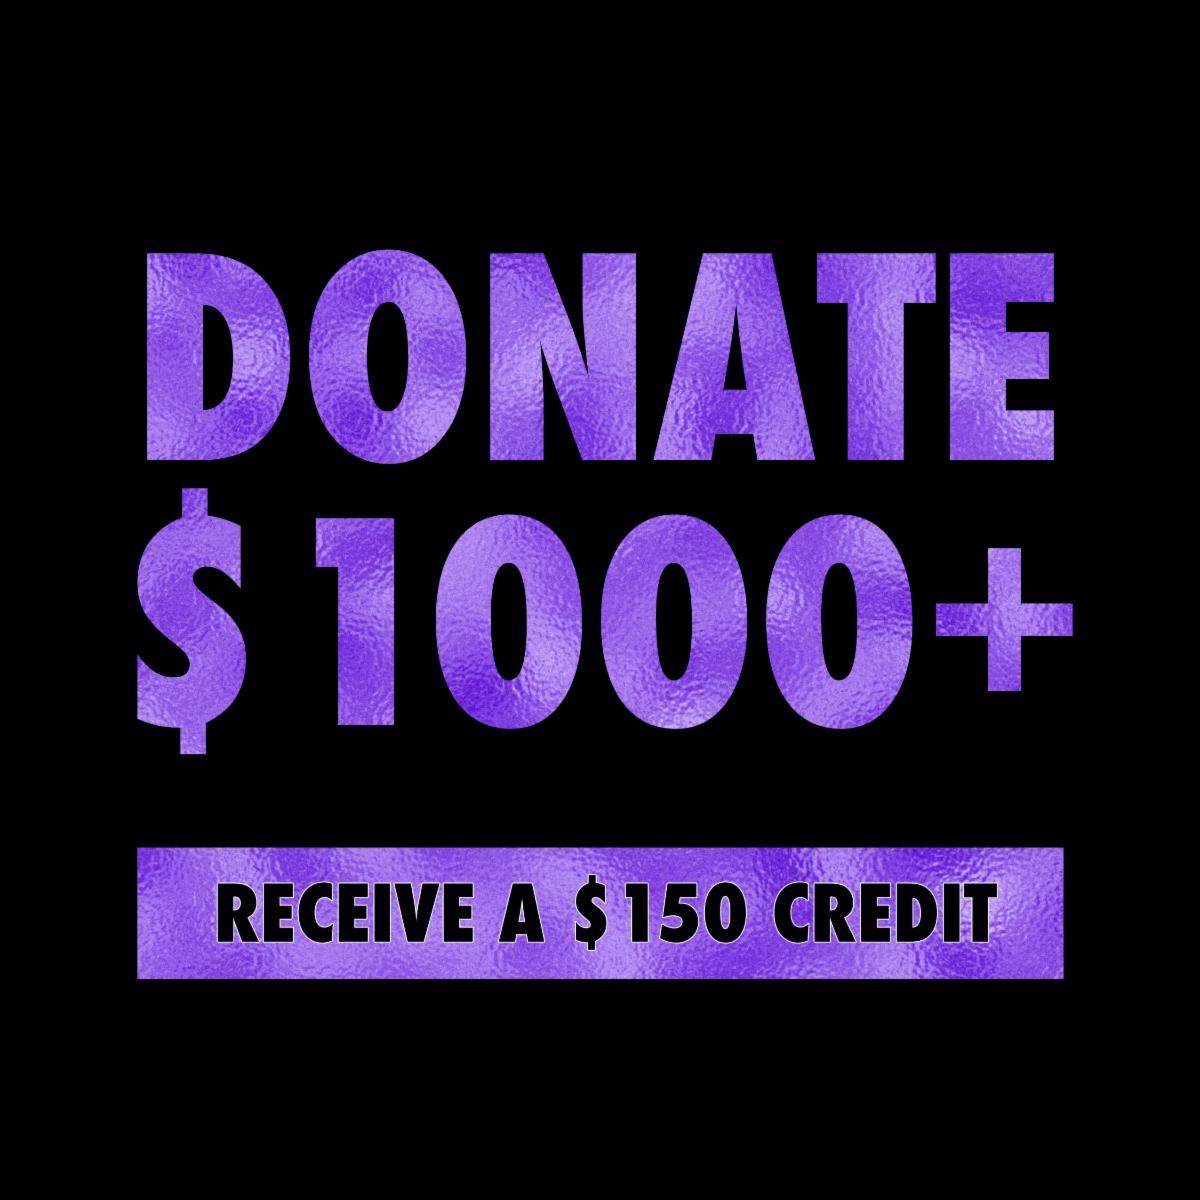 Donate $1000 Receive $150